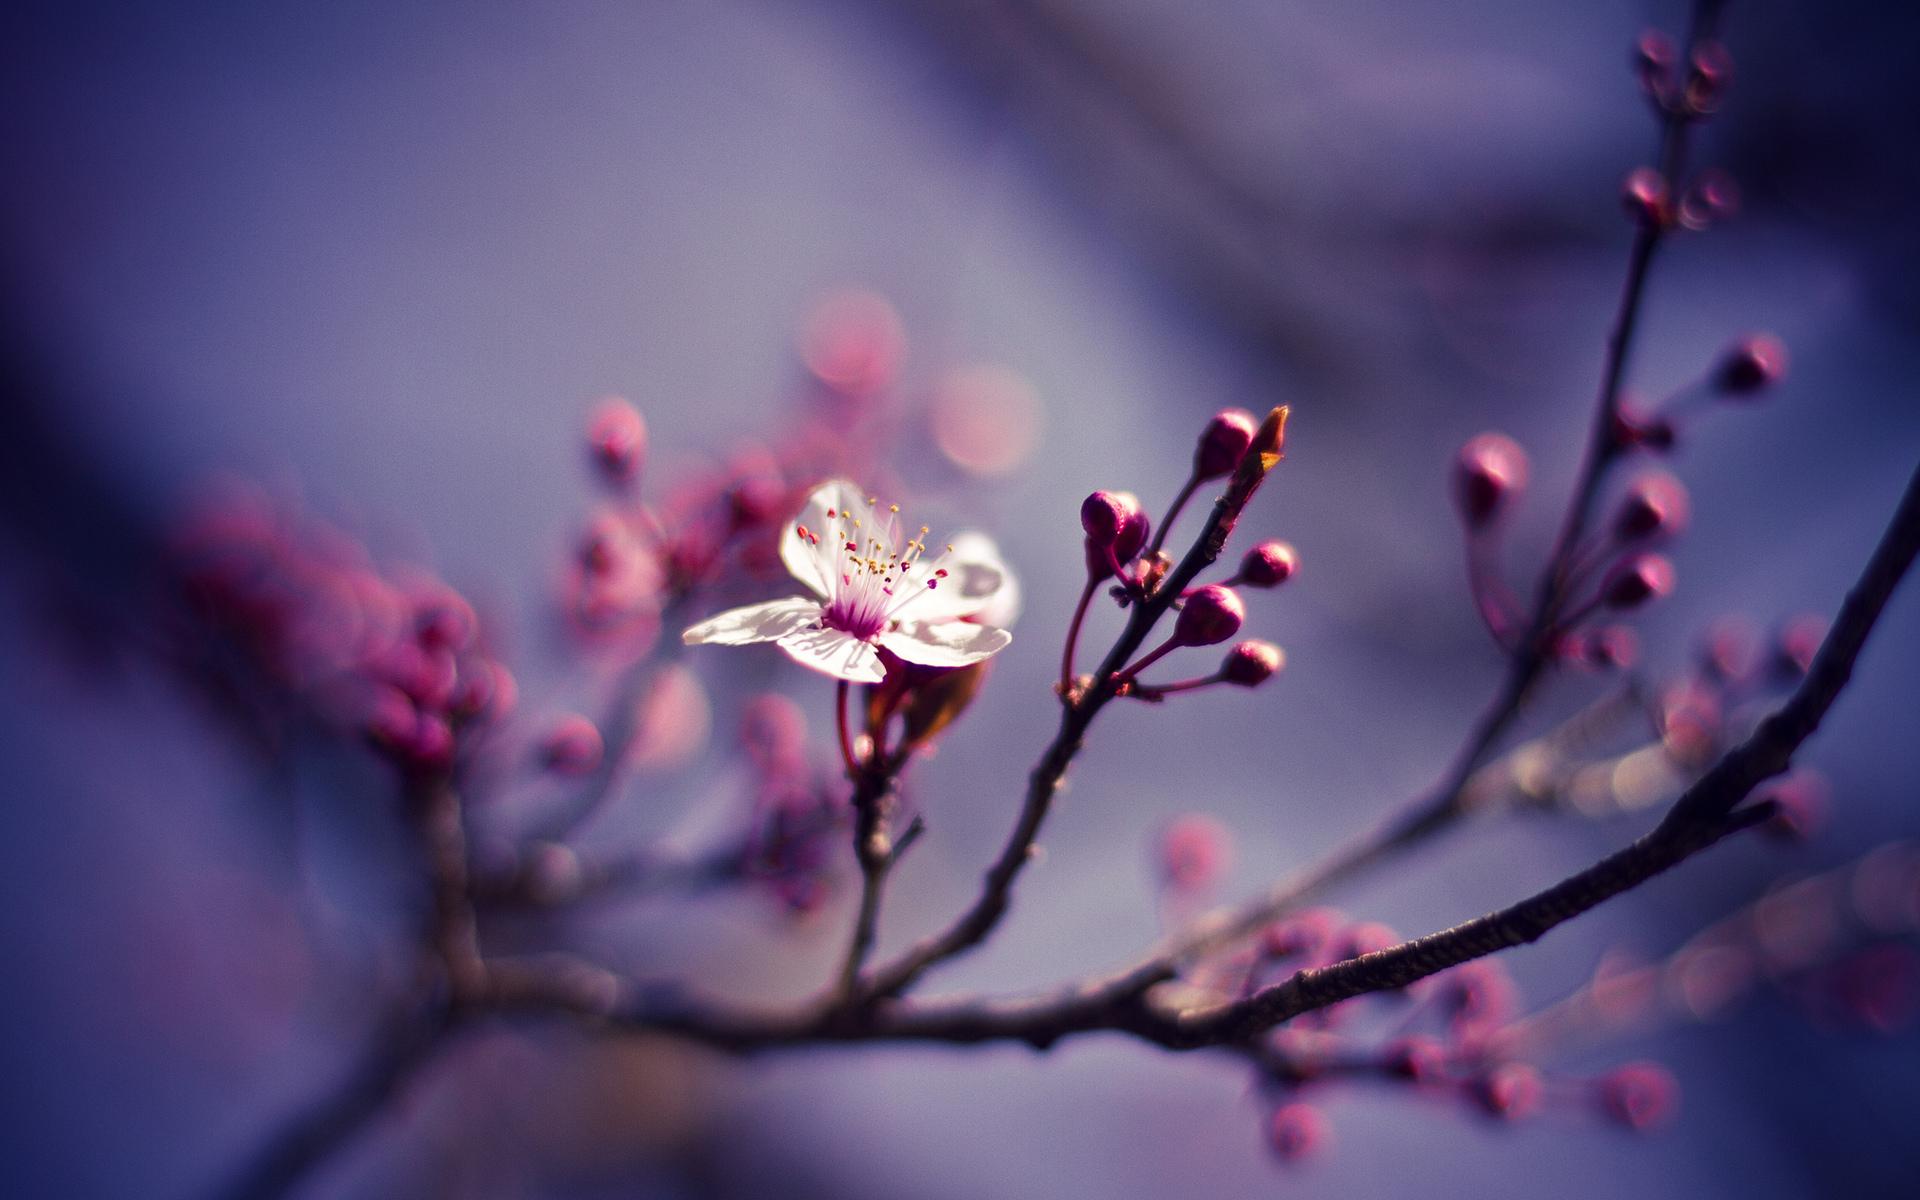 cherry blossom wallpaper cute - HD Desktop Wallpapers | 4k HD